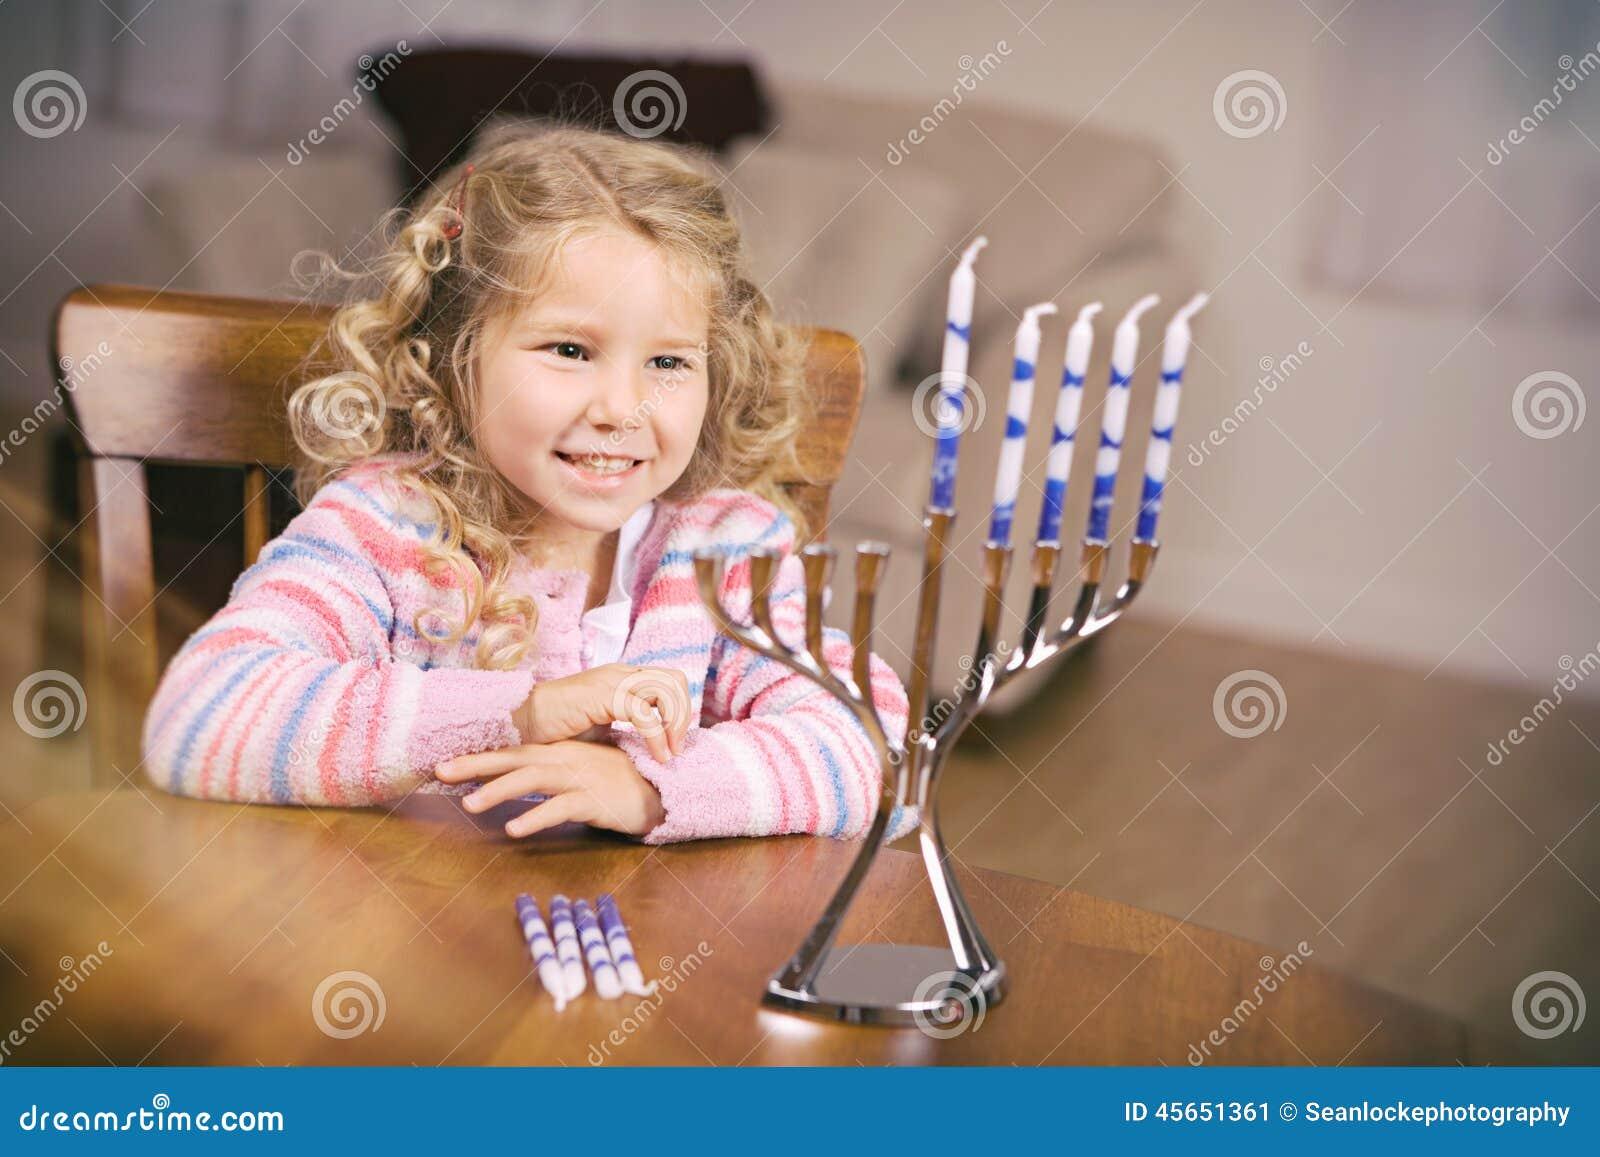 Hanukkah: Menina que senta-se na tabela pronta para iluminar velas